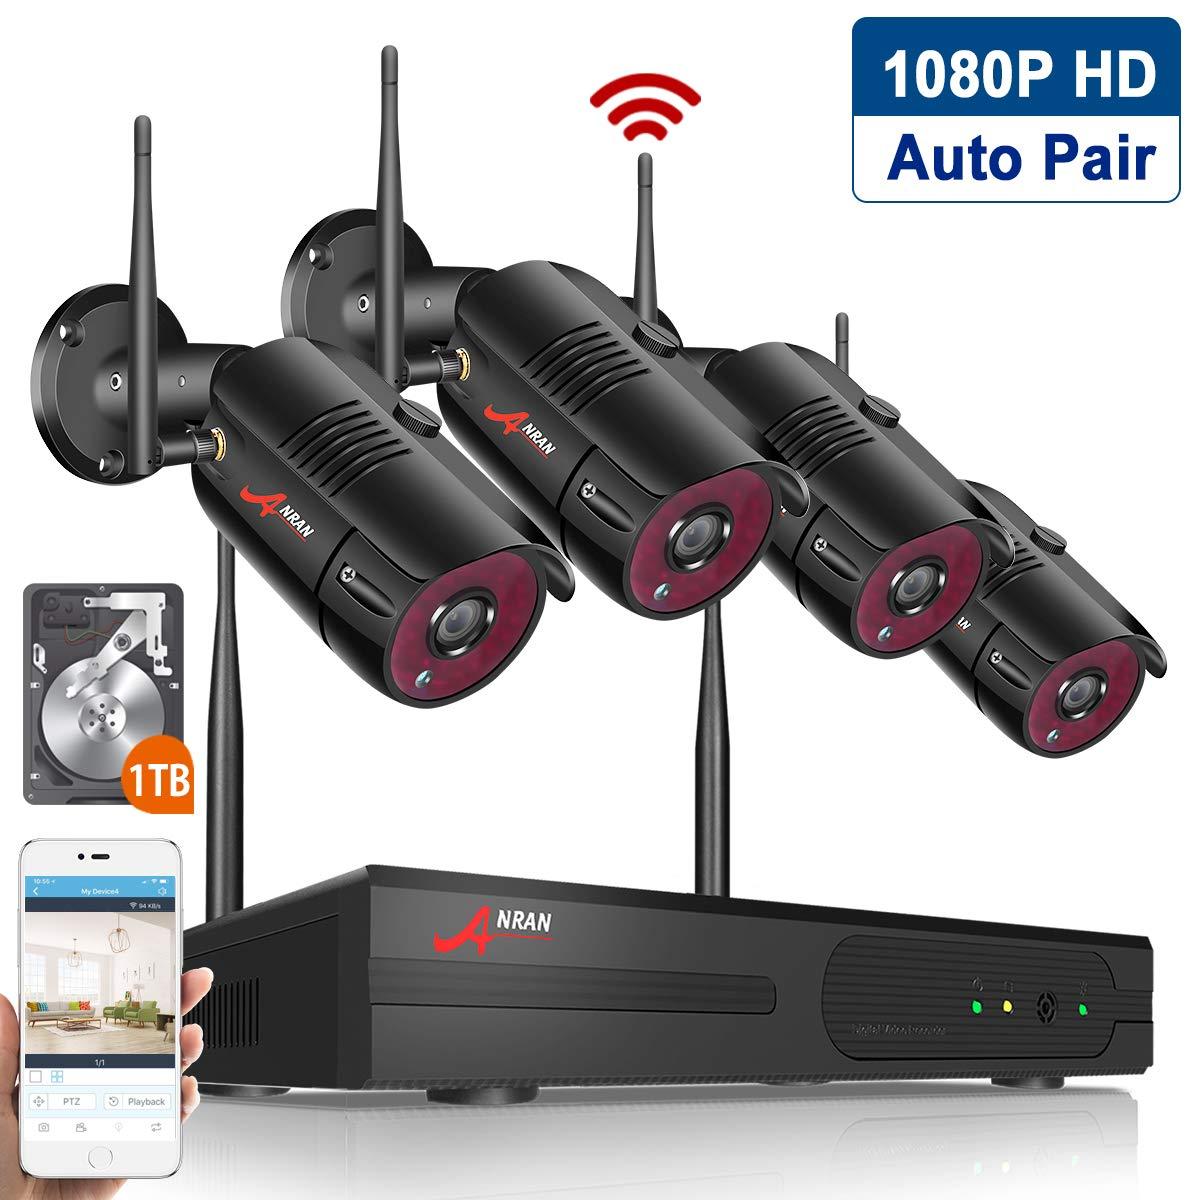 4ch 1080p Hd Nvr Outdoor Surveillance System Anran